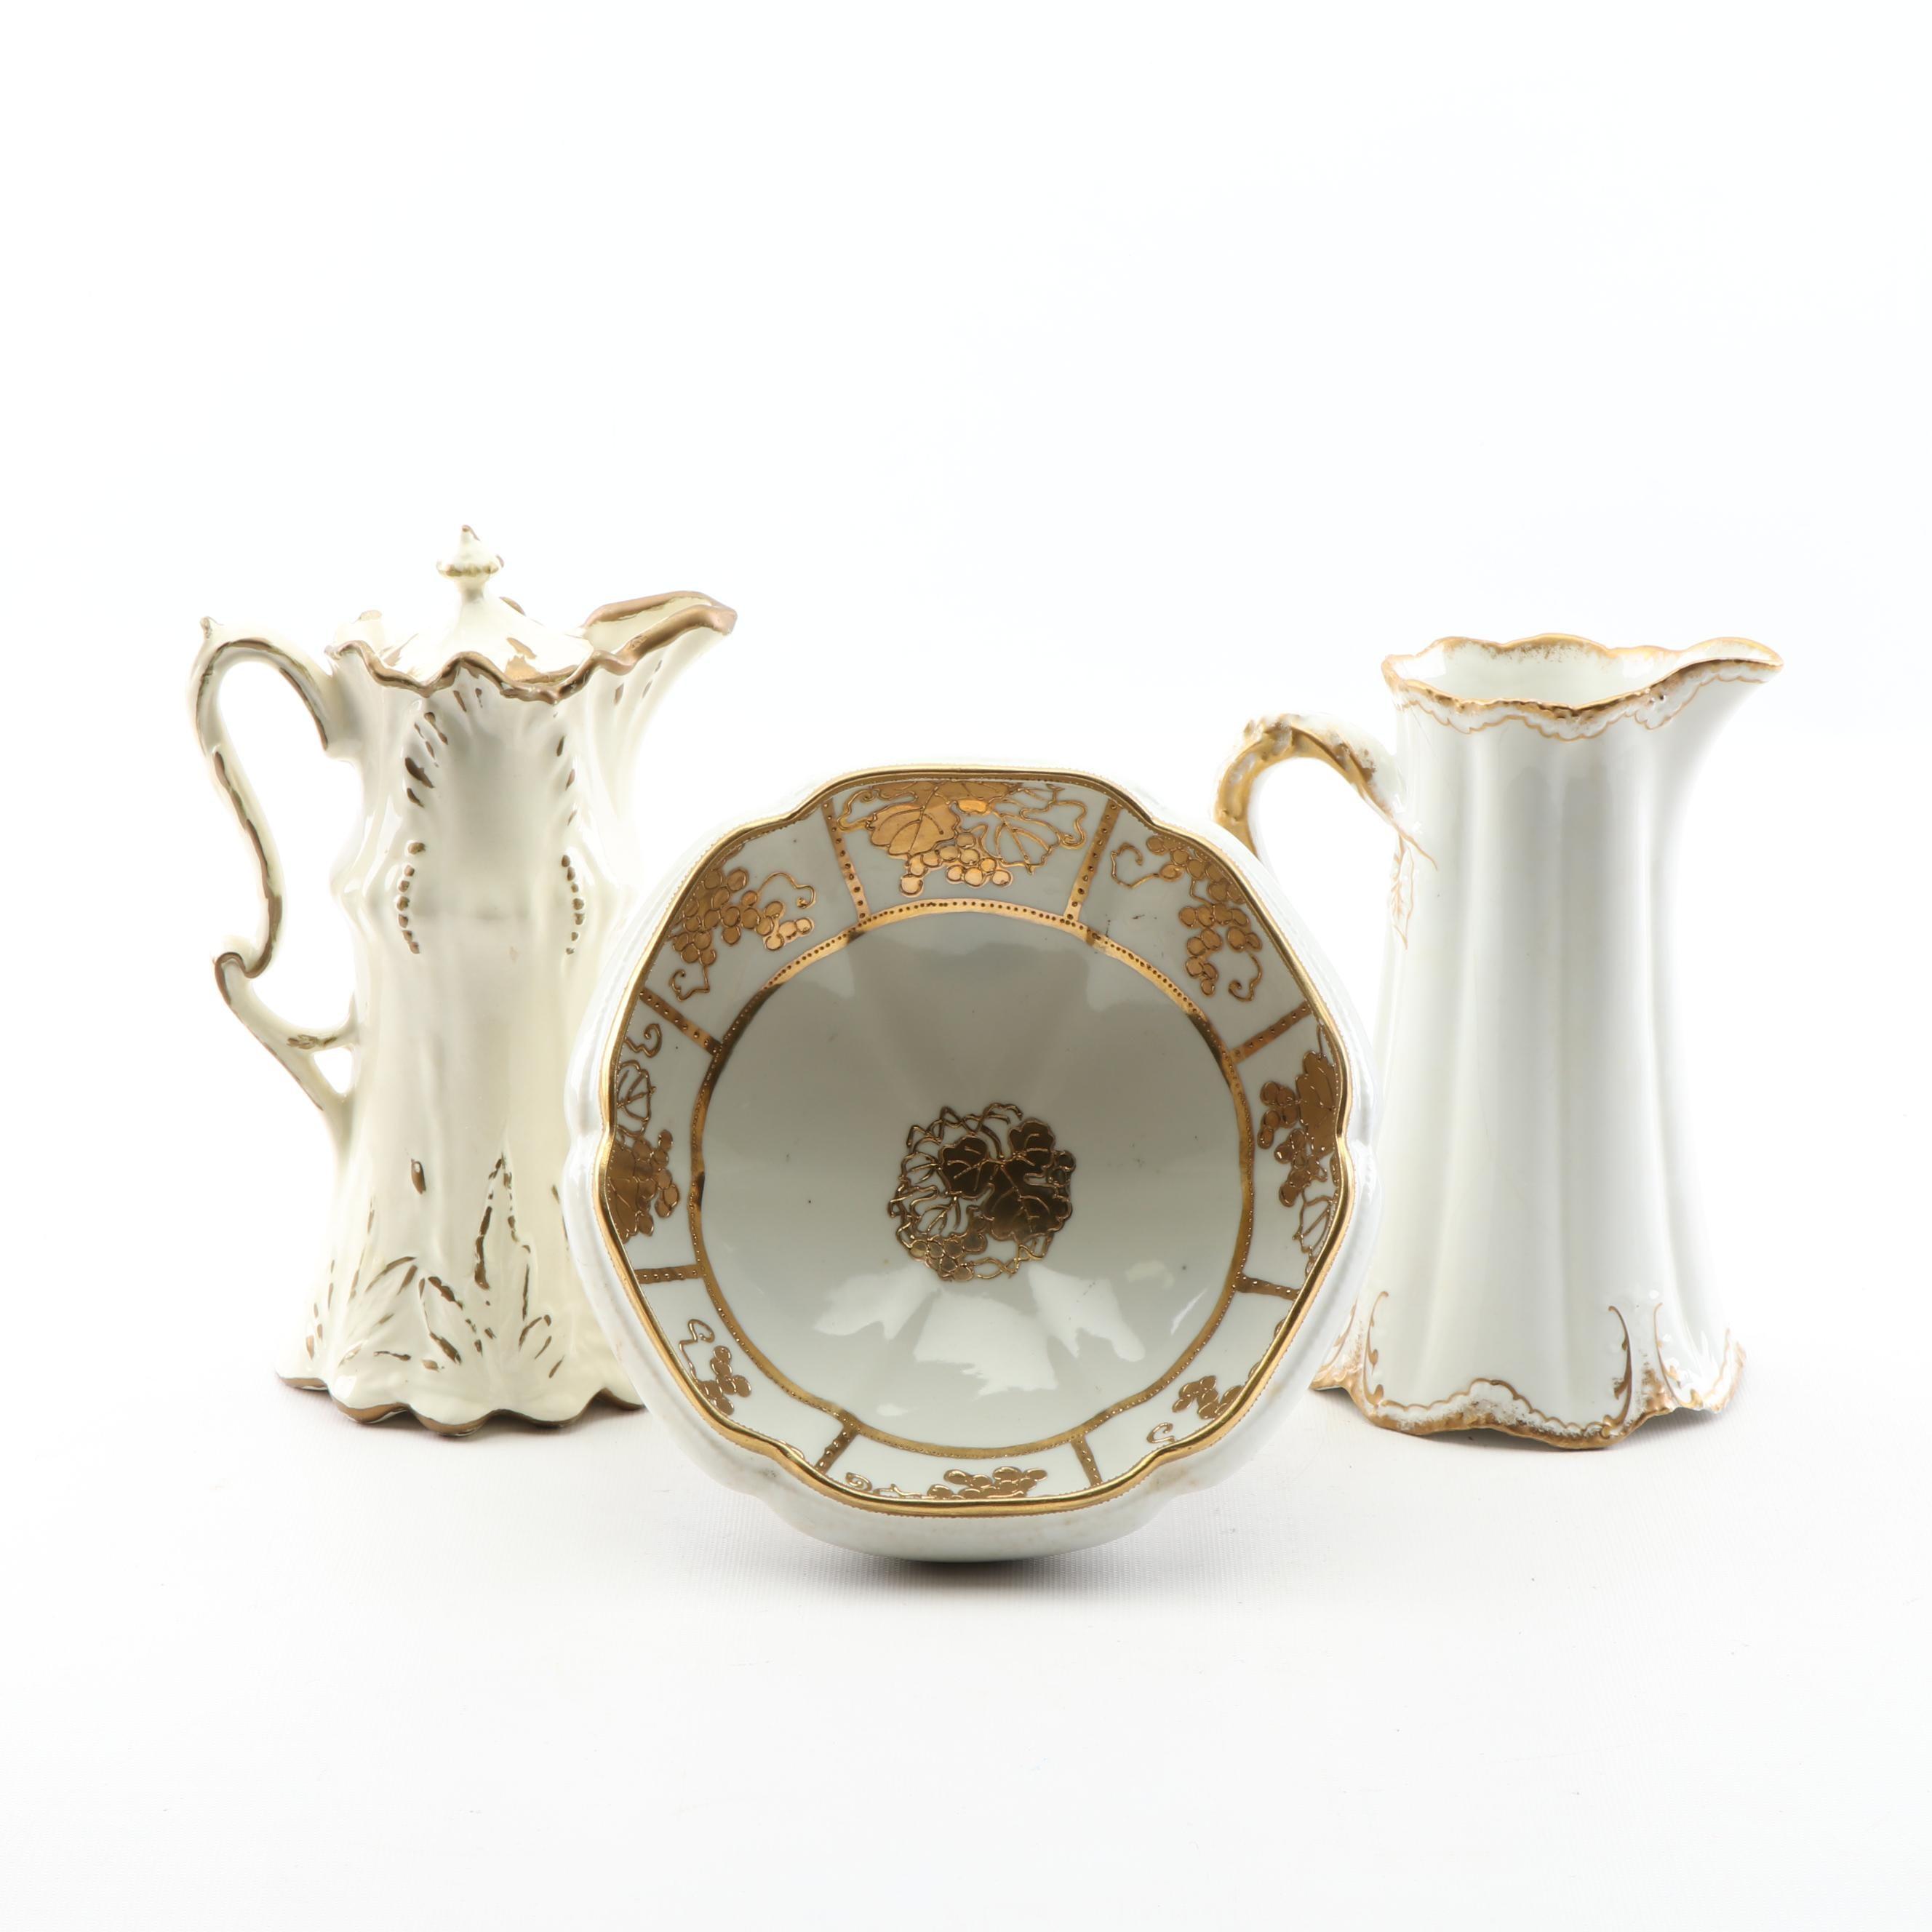 Porcelain Tableware including Noritake Nippon and Theodore Haviland